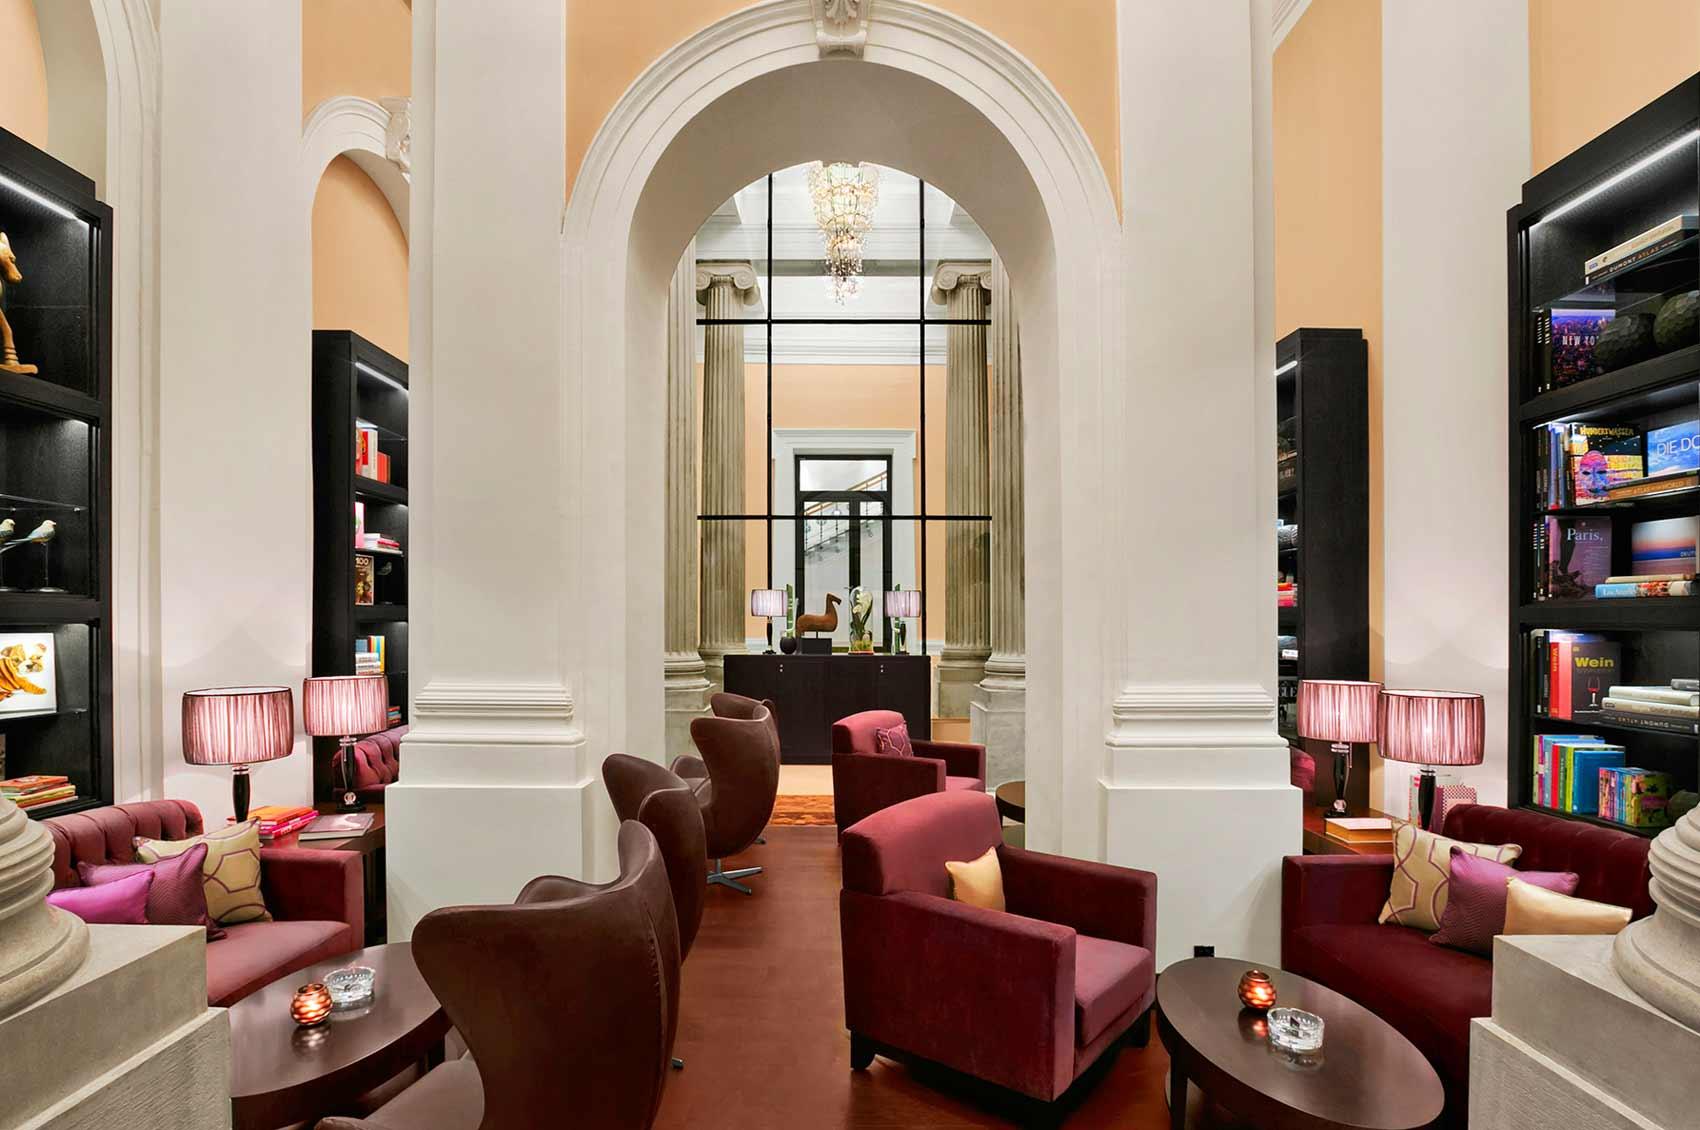 Vienna hotels fodor s - Vienna Hotels Fodor S 5